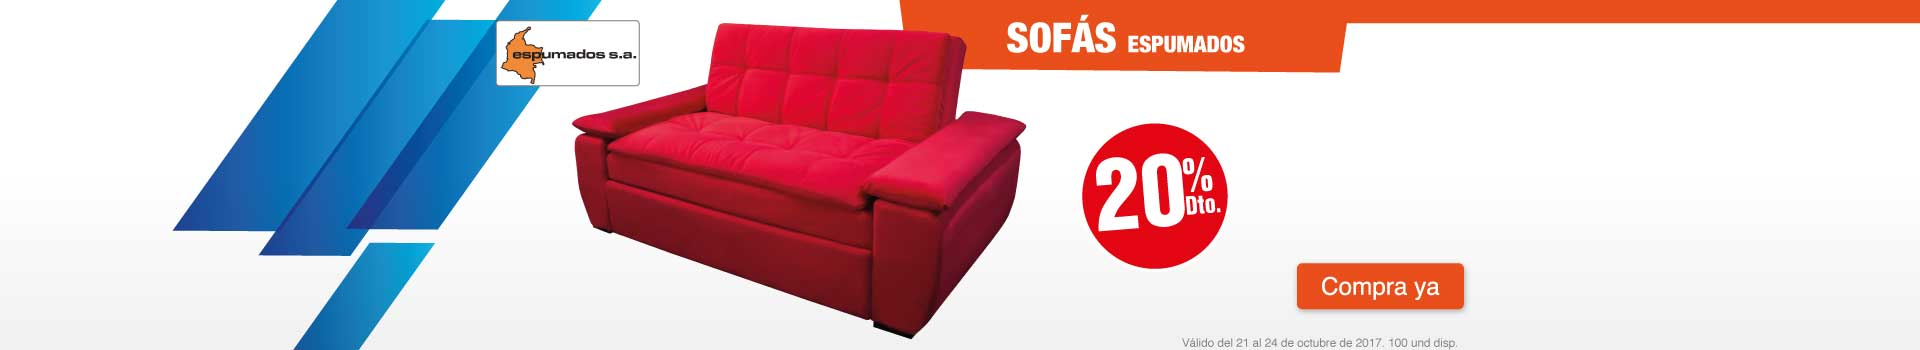 CAT AK -1-muebles-sofas-espumados-octubre21-24